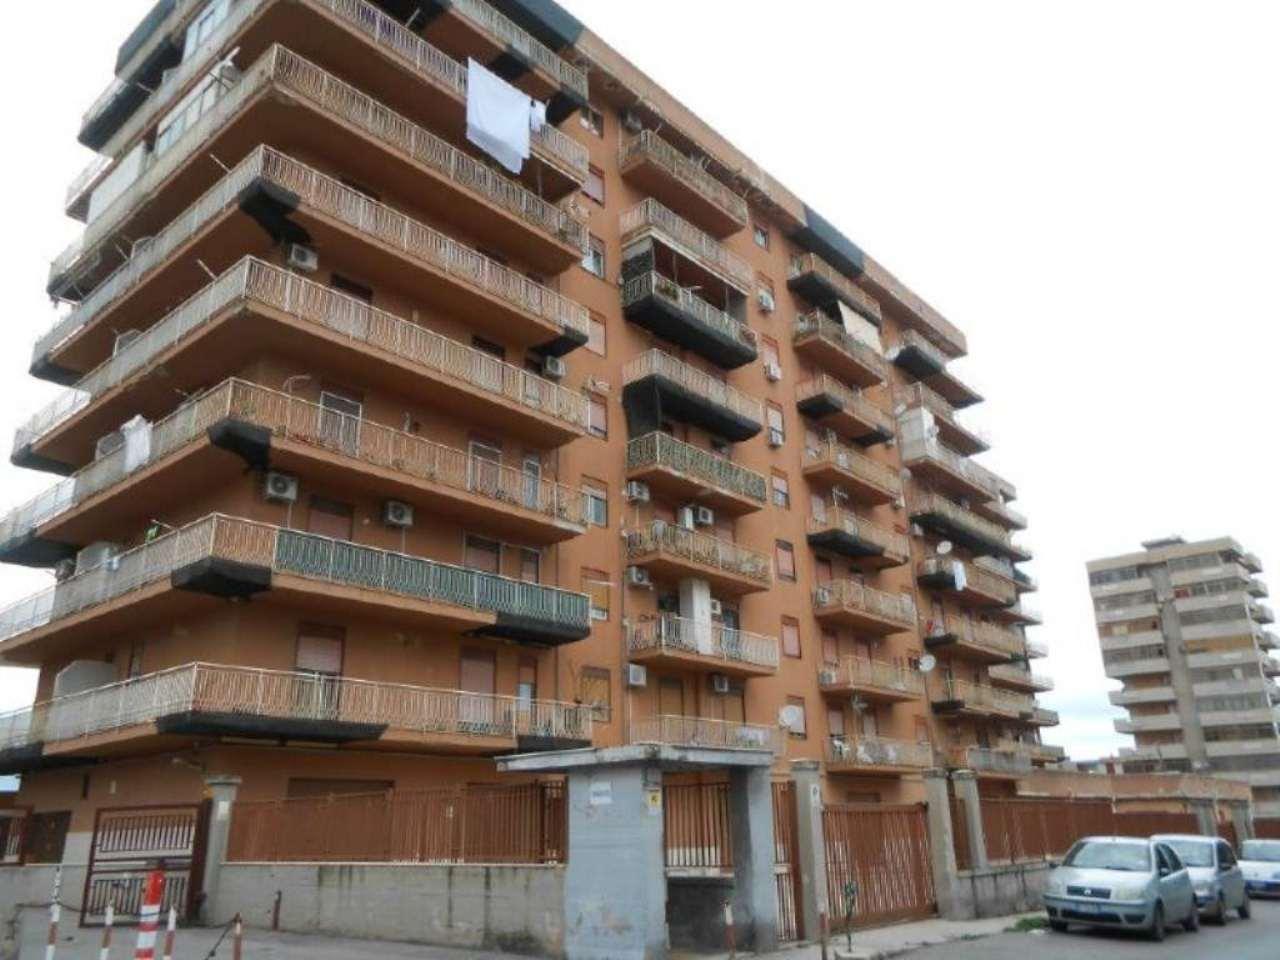 Bilocale Palermo Largo Os 1